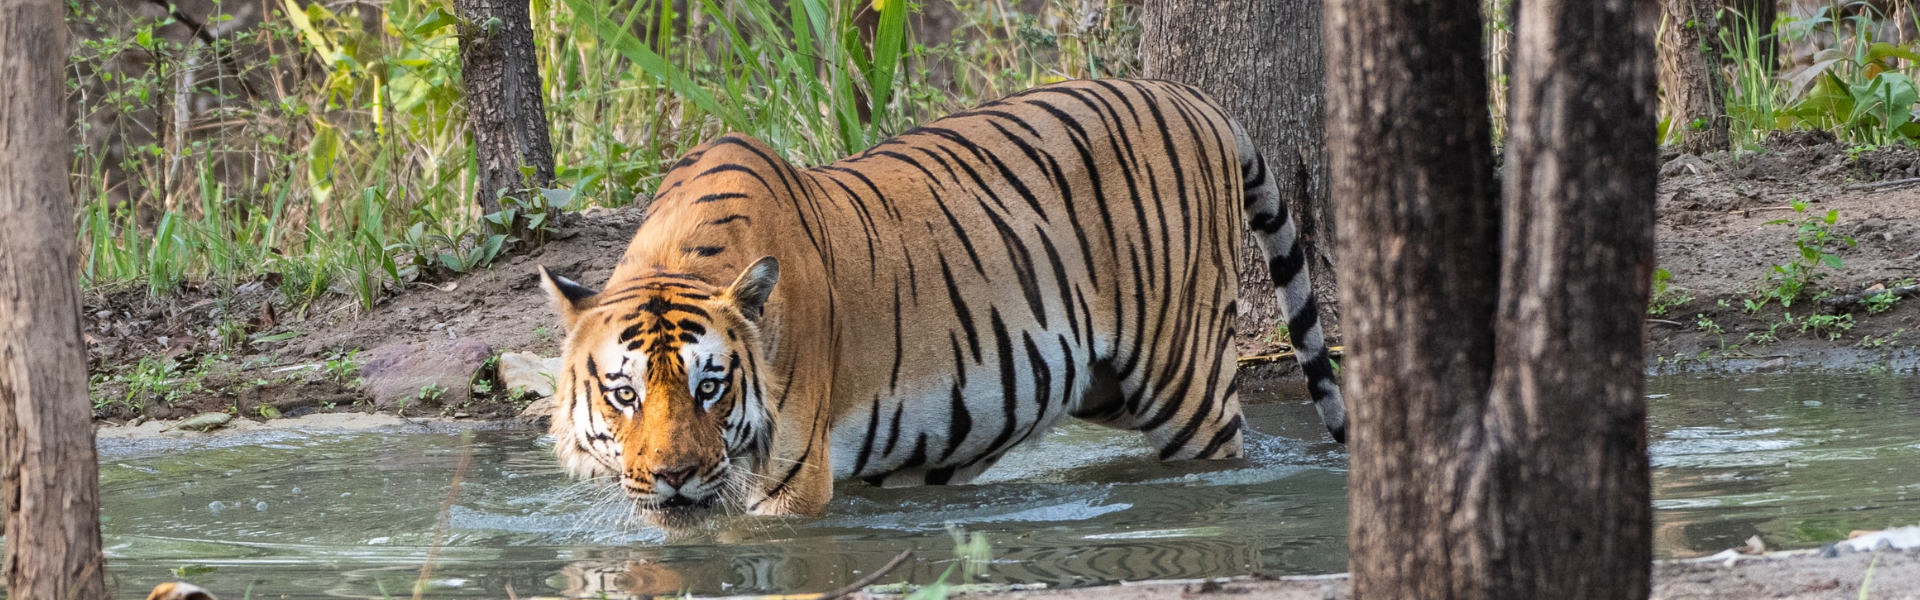 Tiger, Nepal